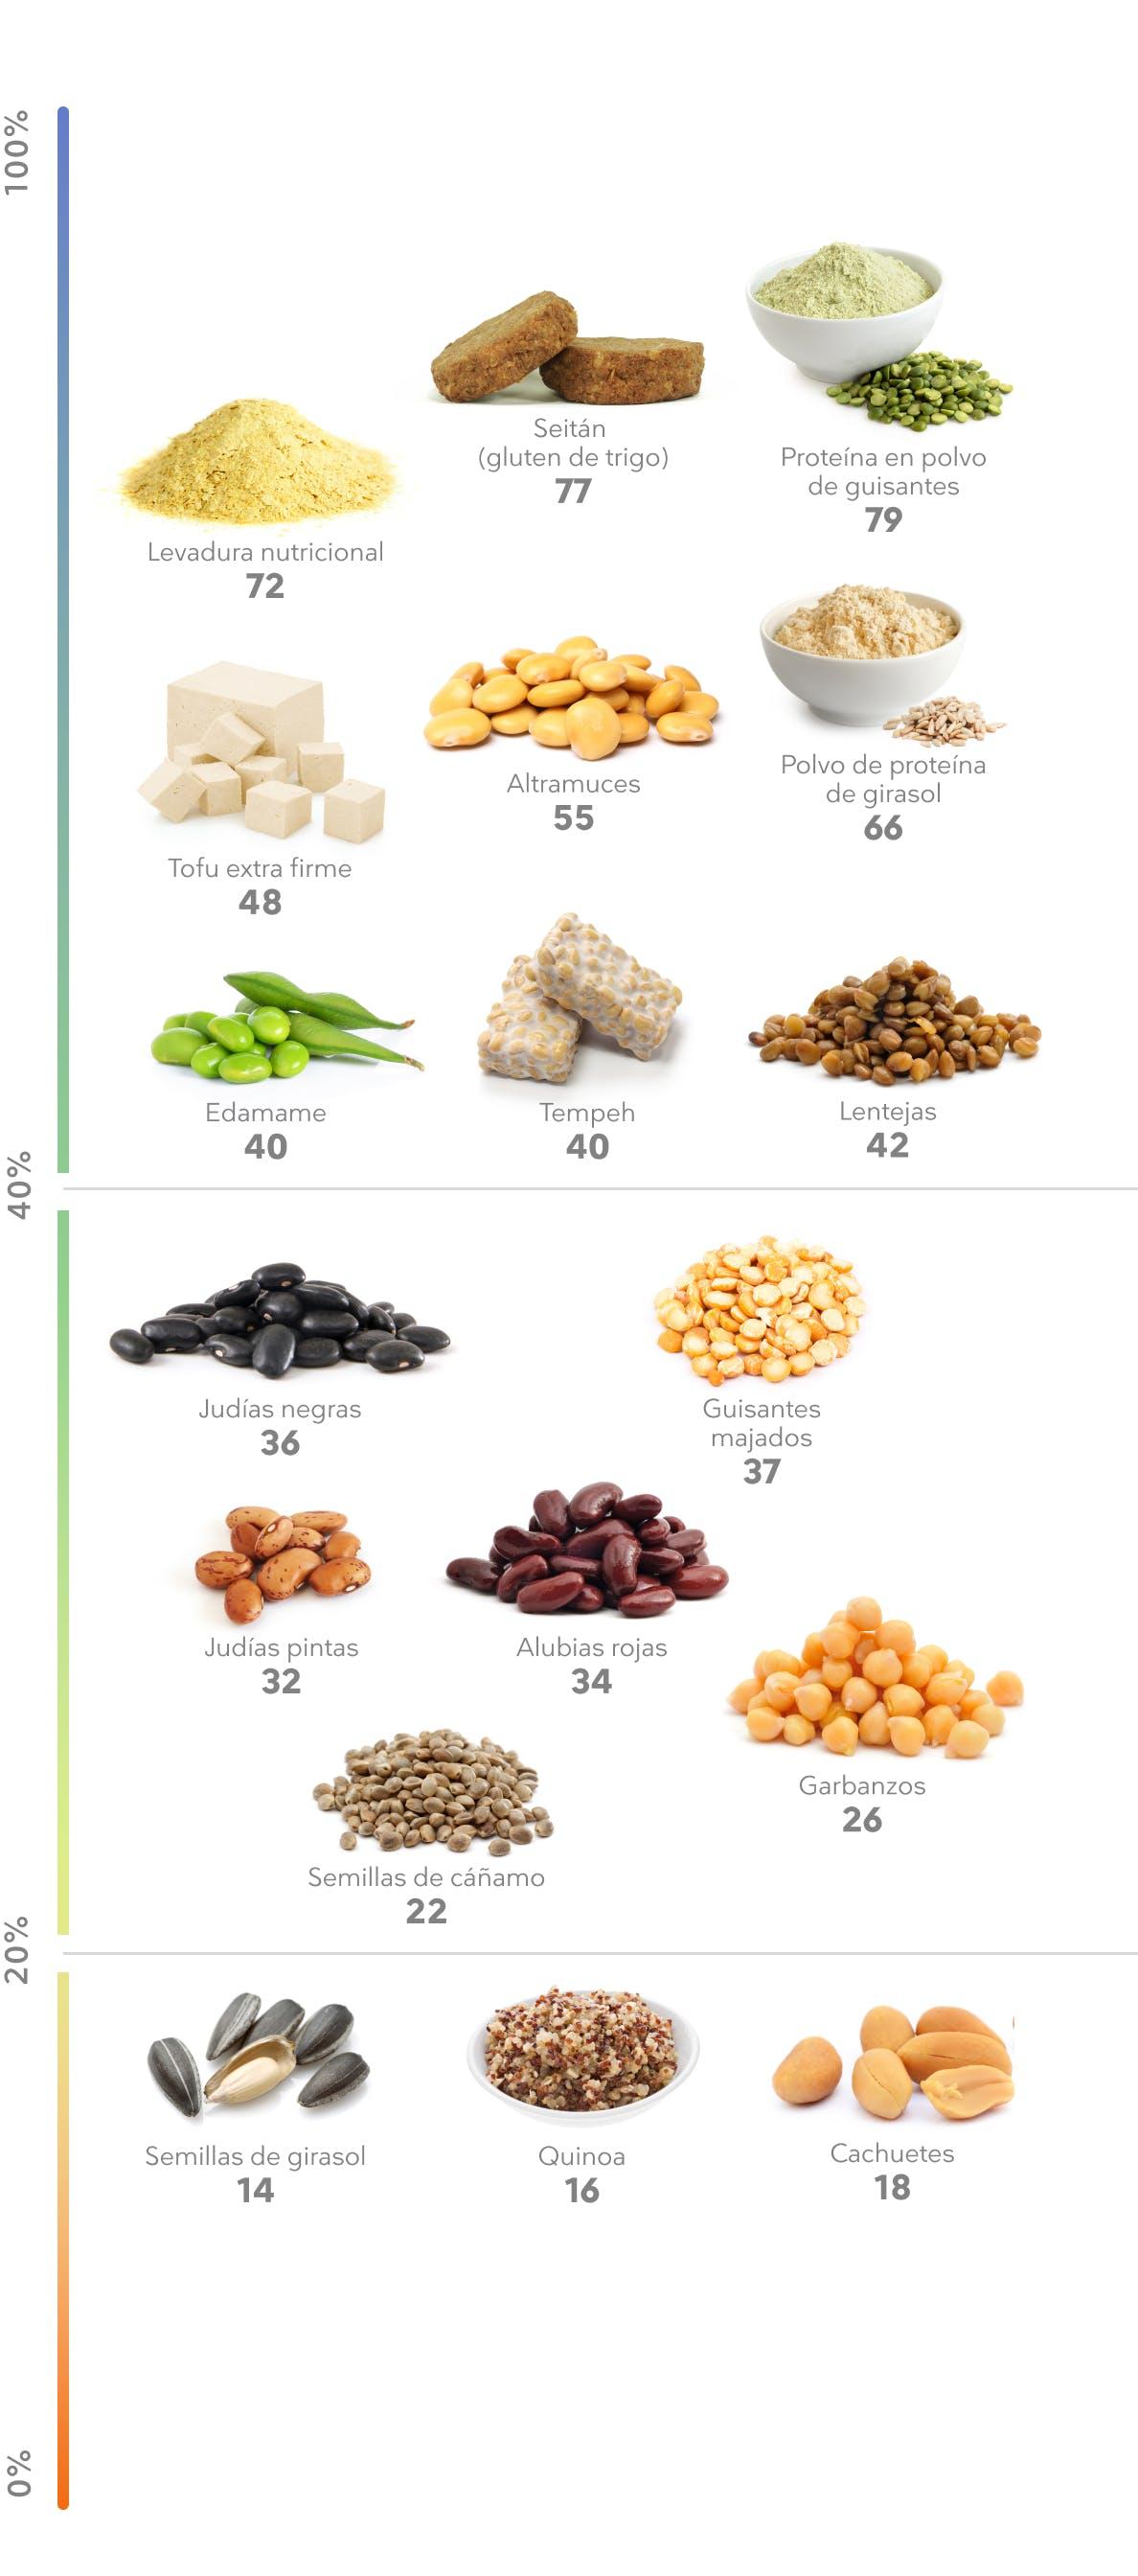 Fuentes de proteína de origen vegetal